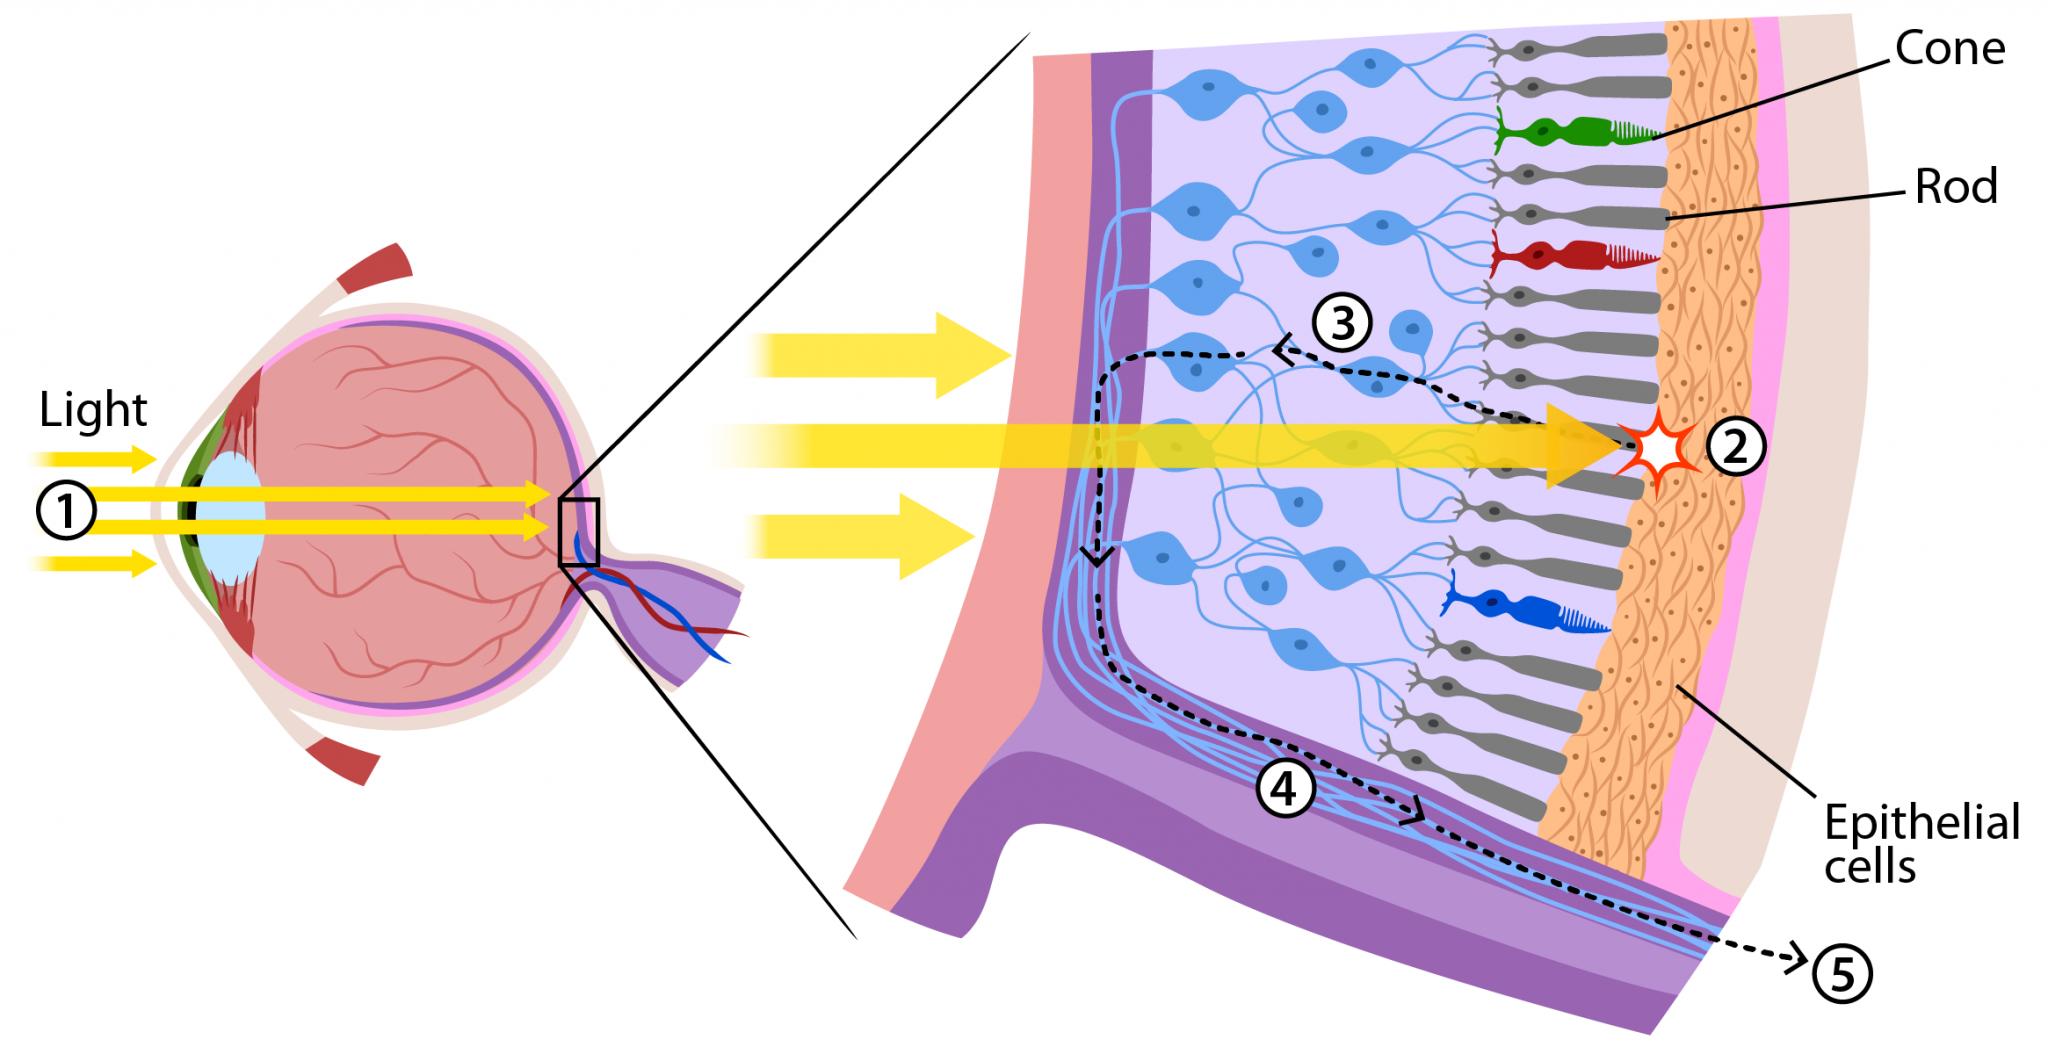 Retina Rod Cone